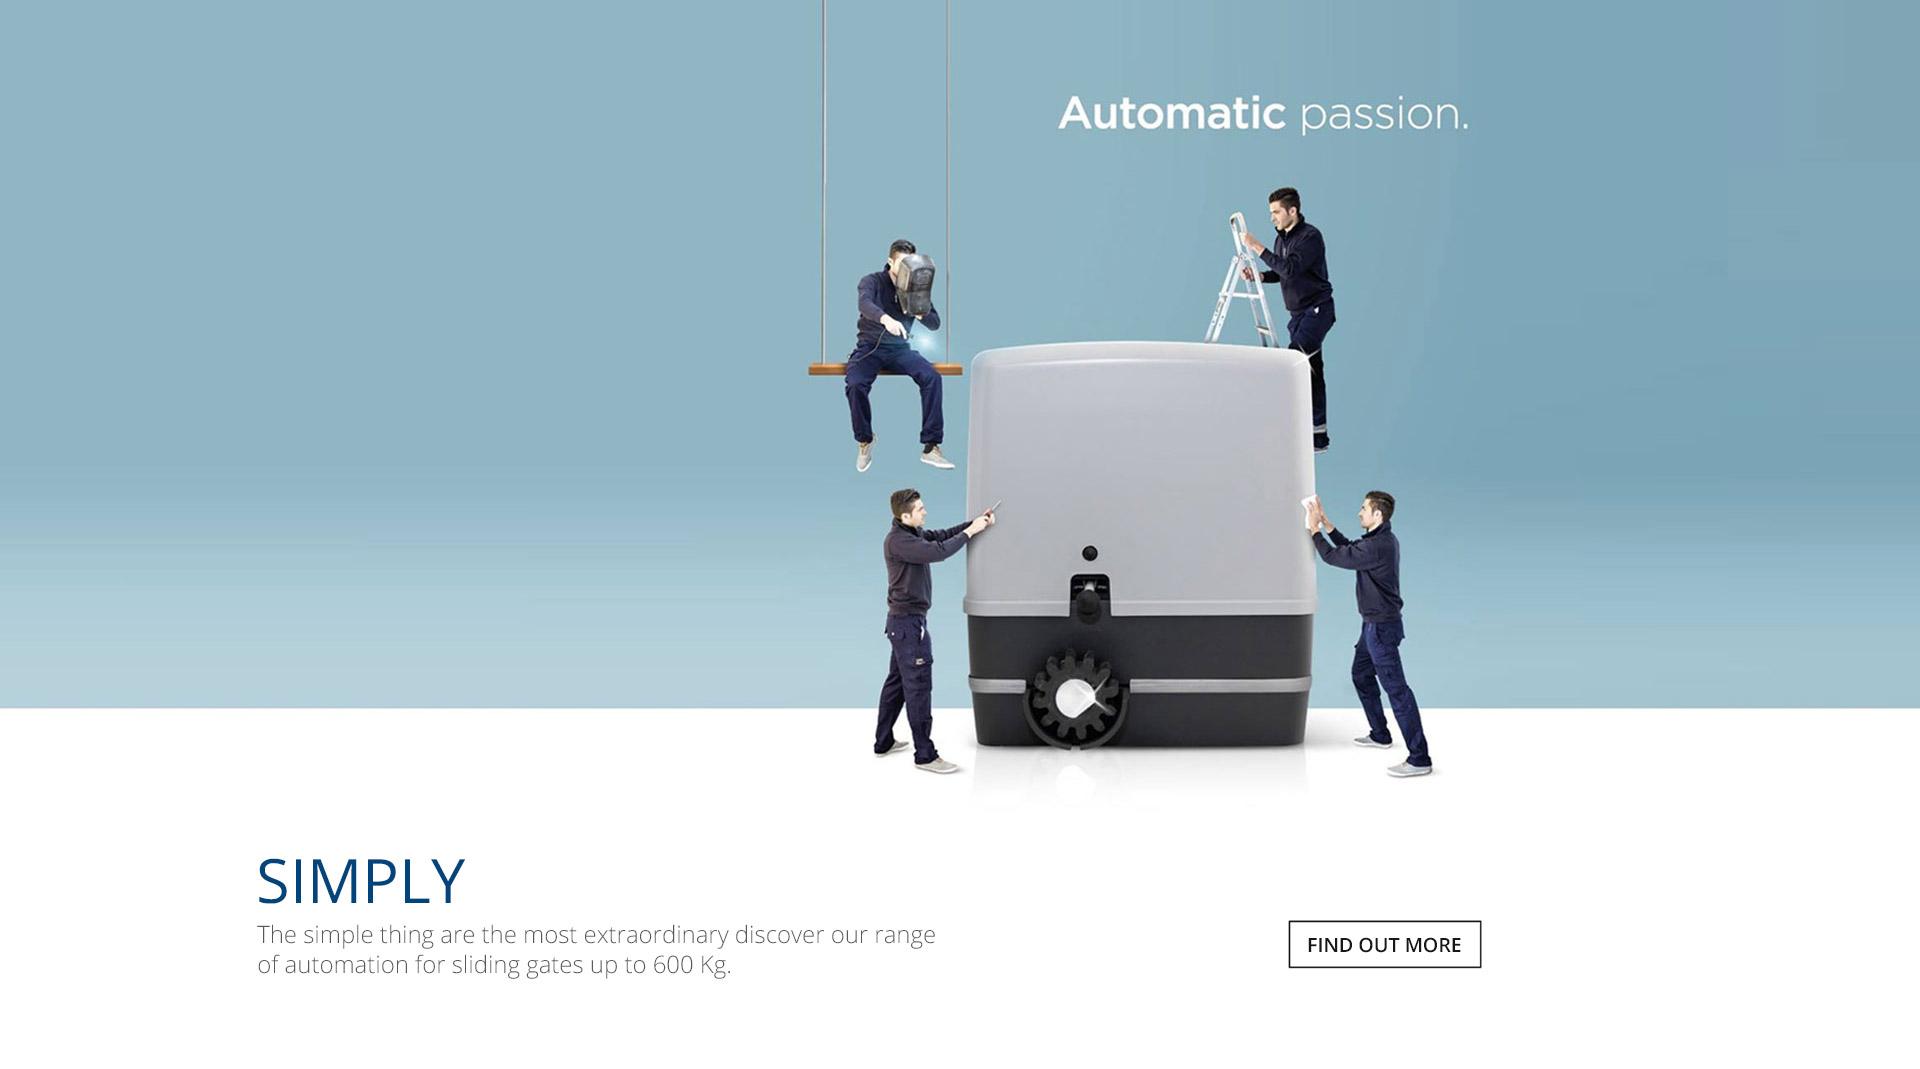 VDS Automation Swing Gates Sliding Gates Doors Counterweight Garage